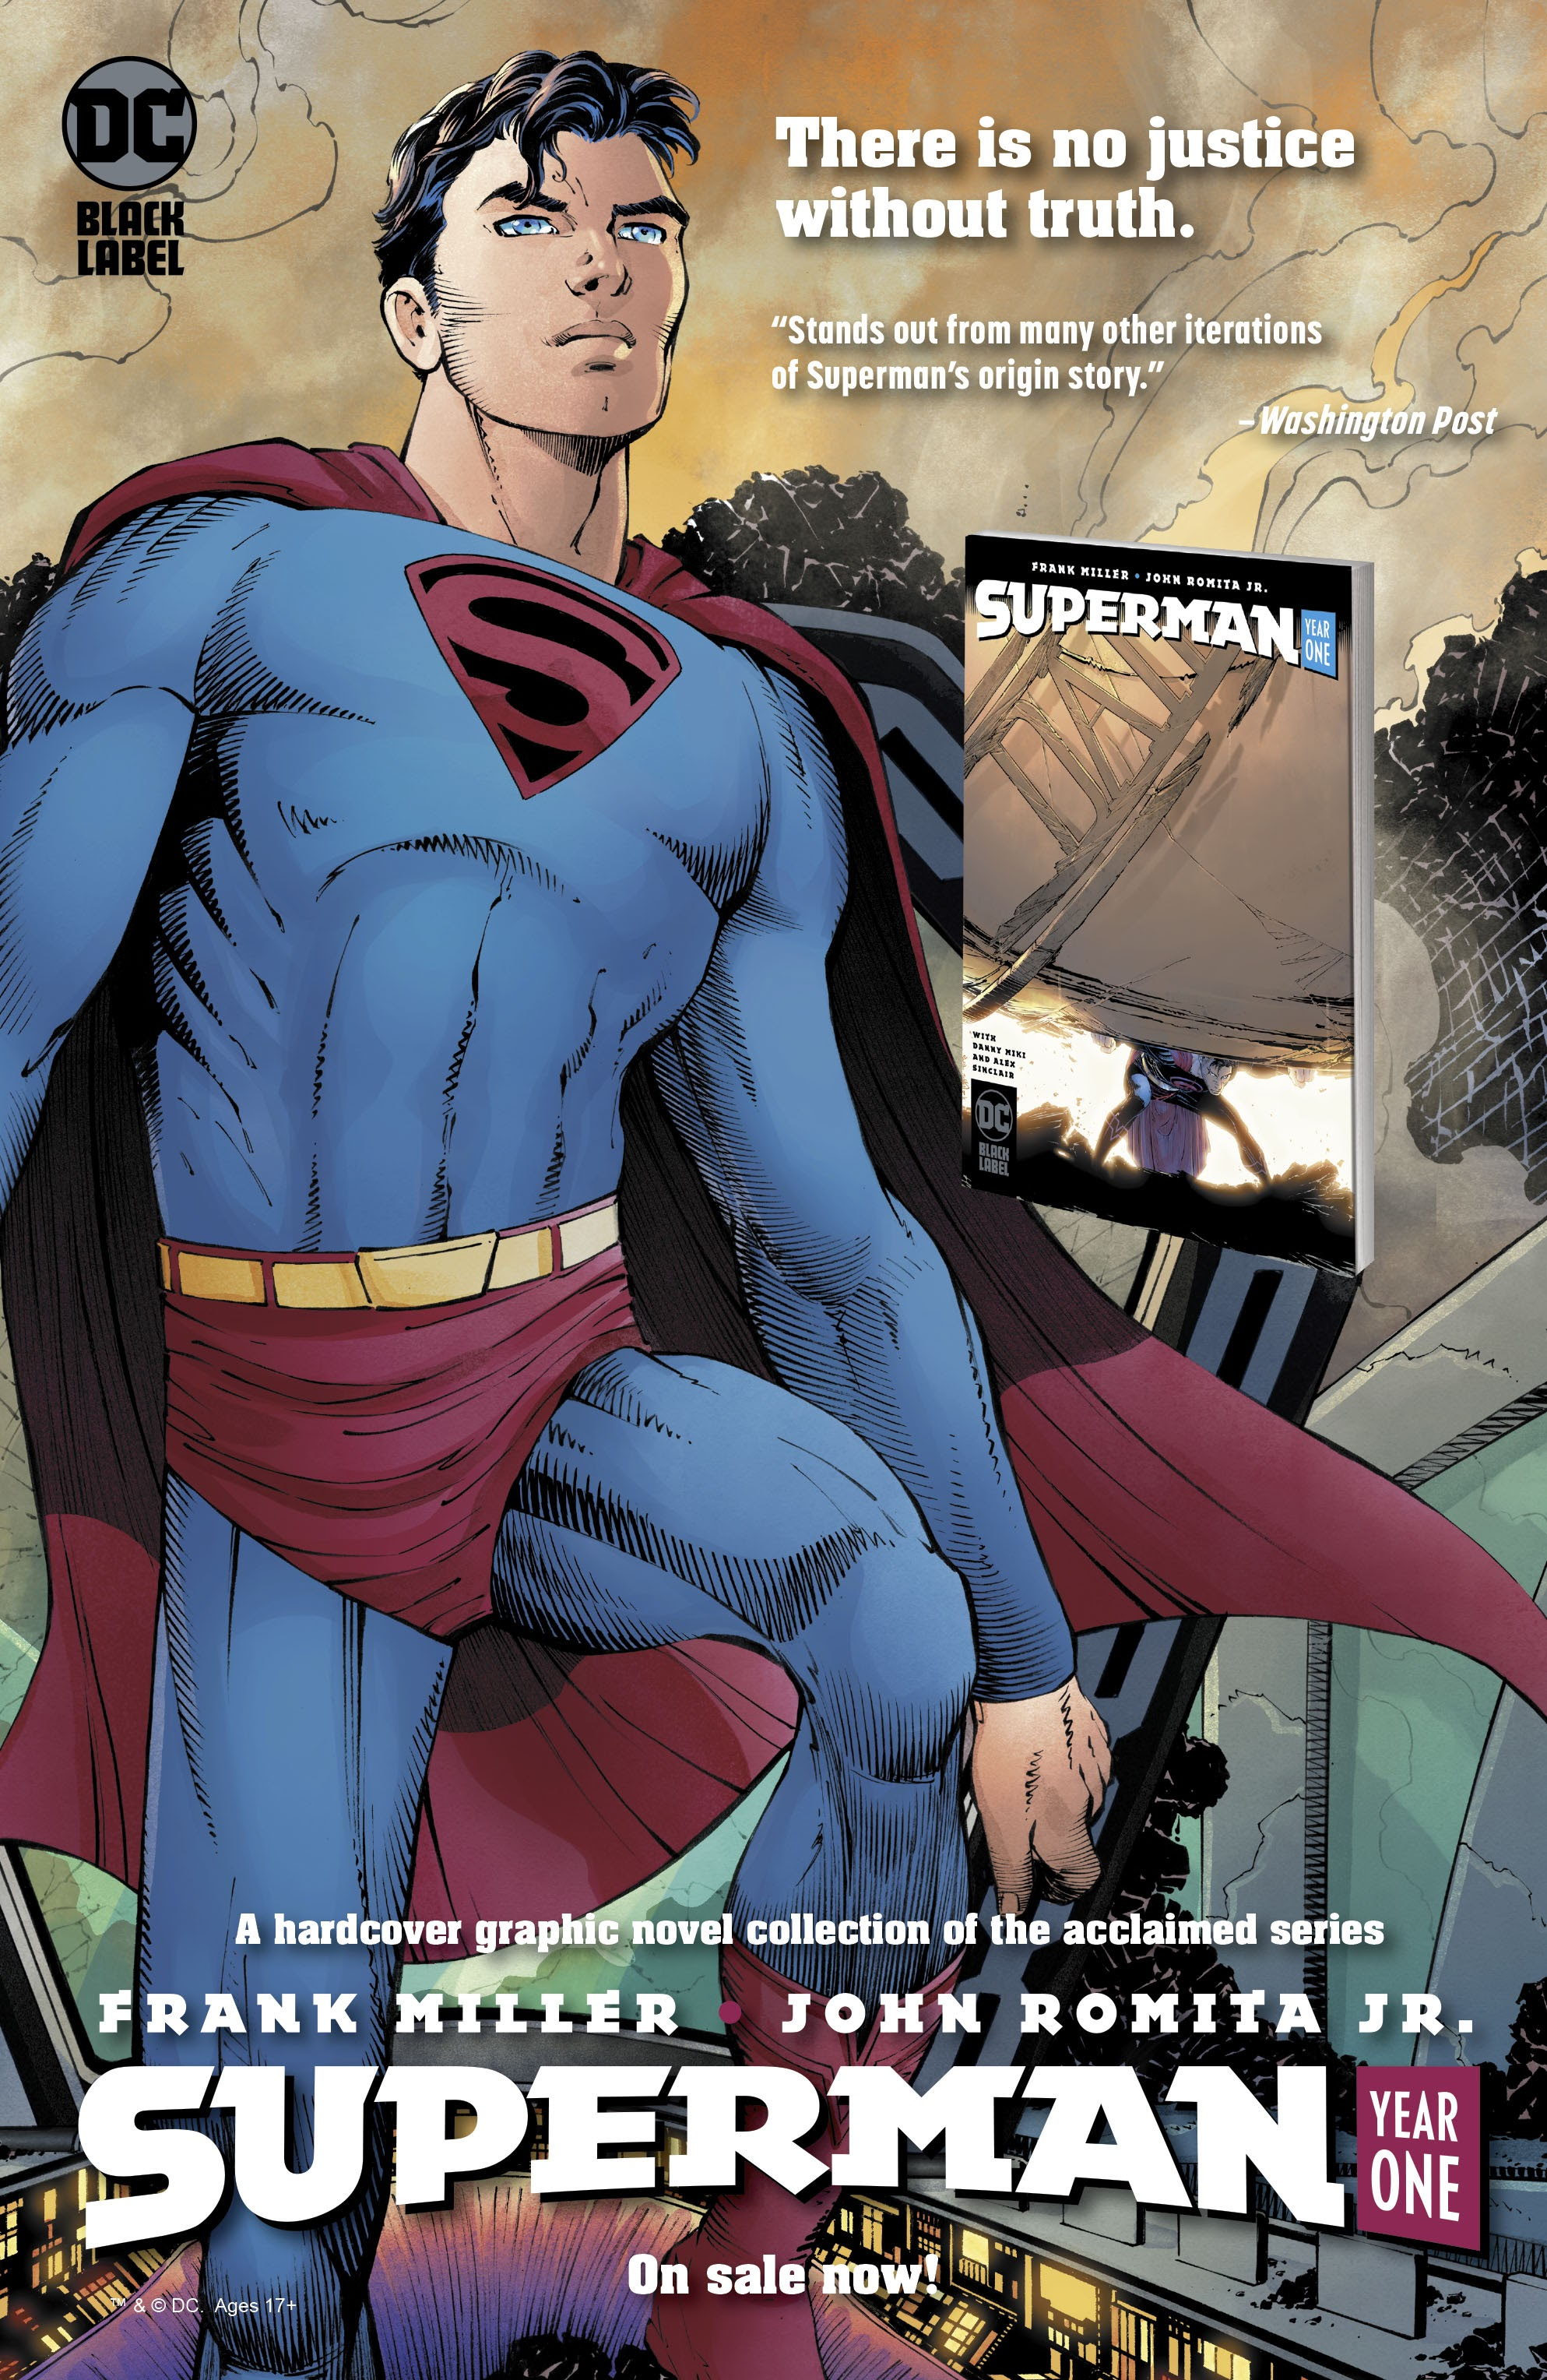 Detective Comics (2016) 1017 Page 2